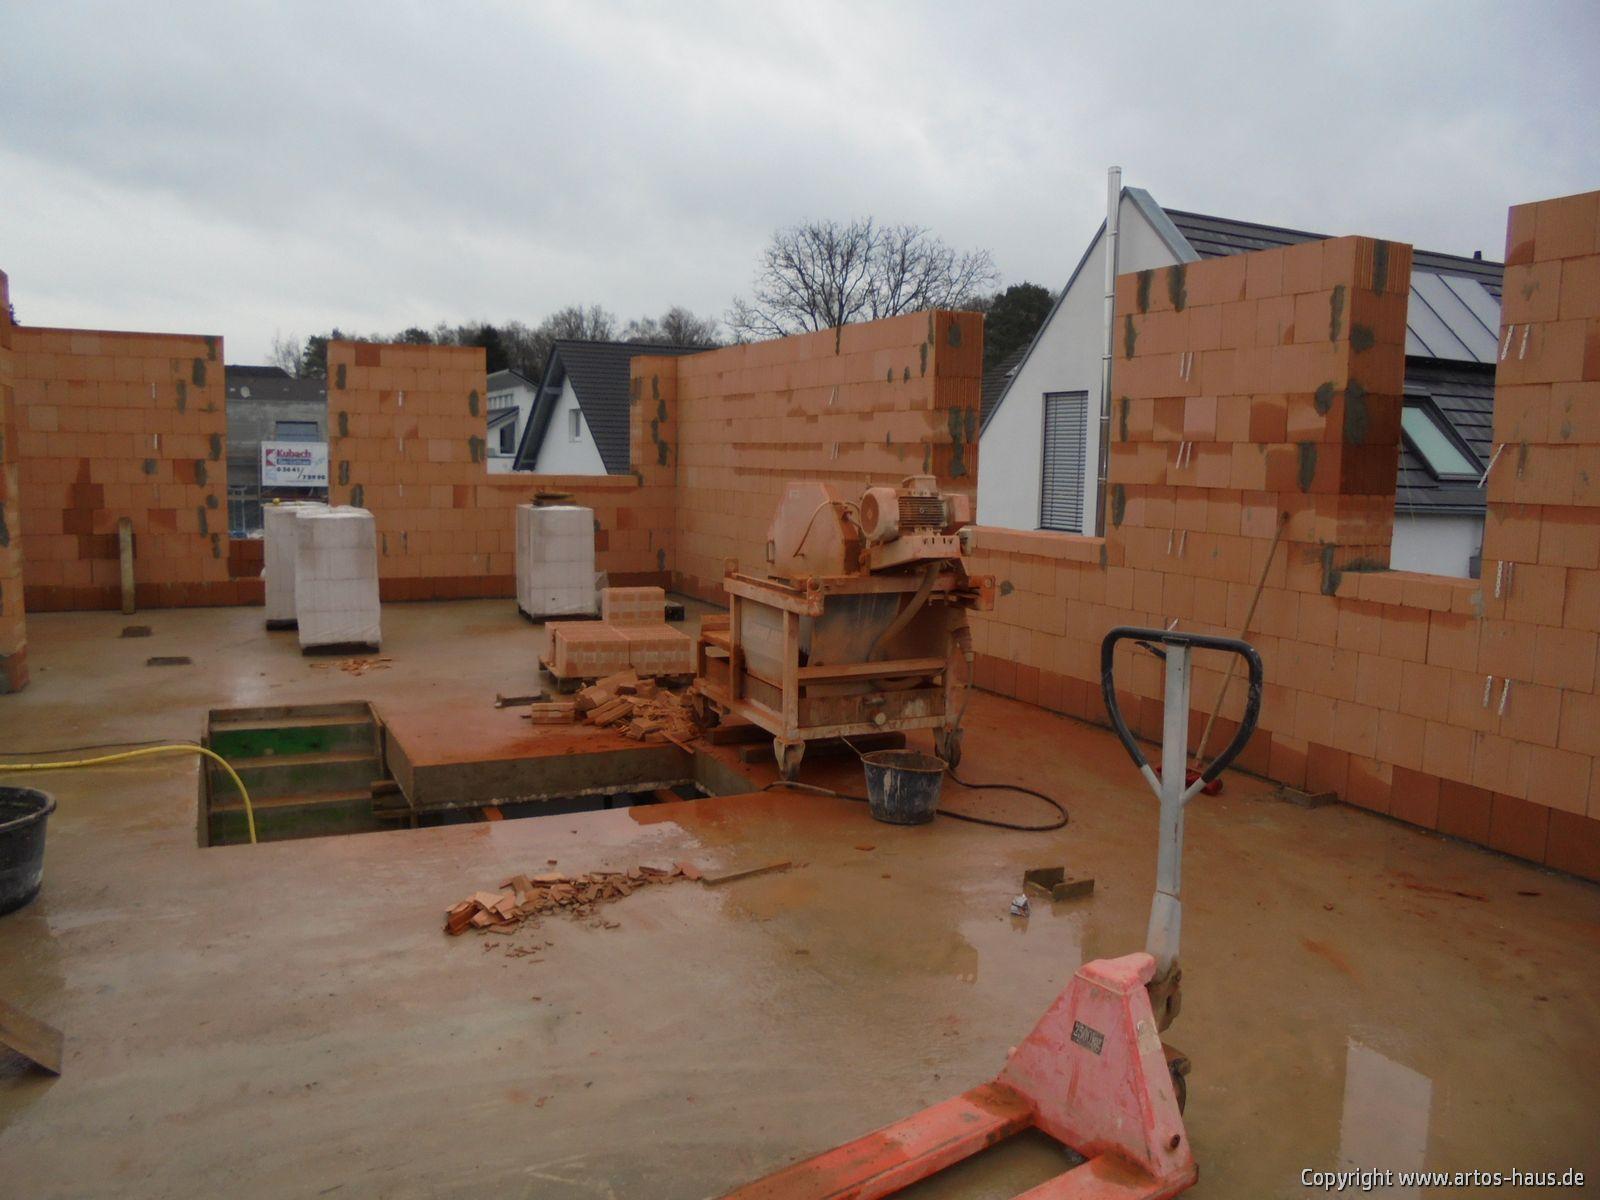 Rohbau der Baustelle in Bonn im Januar 2021 / ARTOS-HAUS Bild 2